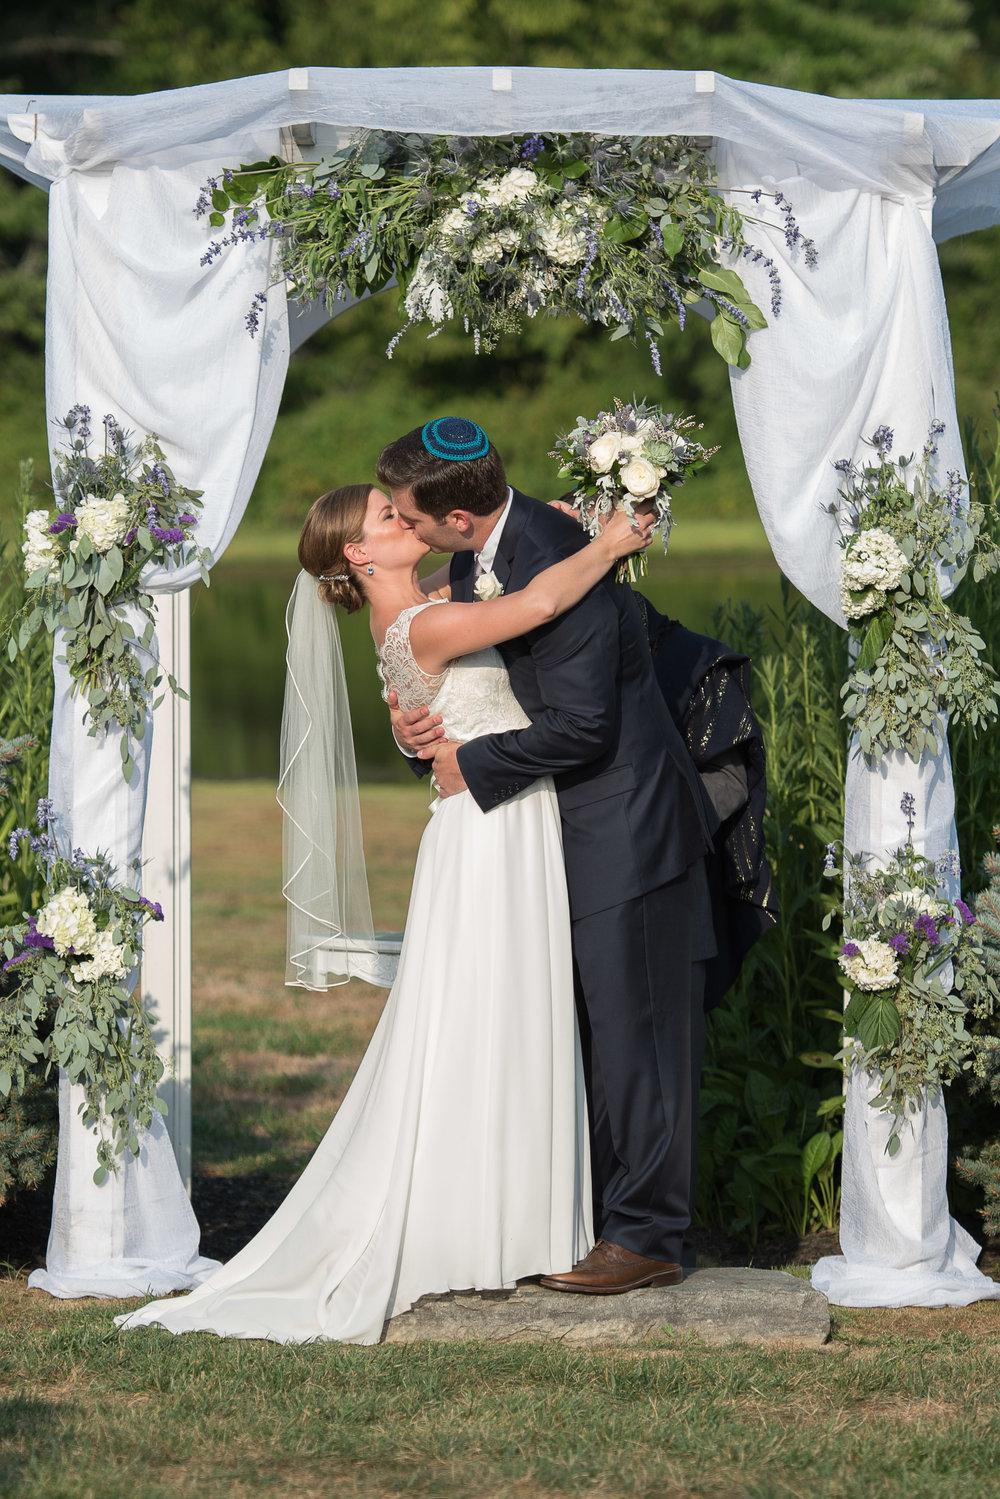 brandywine-wedding-tessie-reveliotis-photography-beautiful-and-blessed-events-049